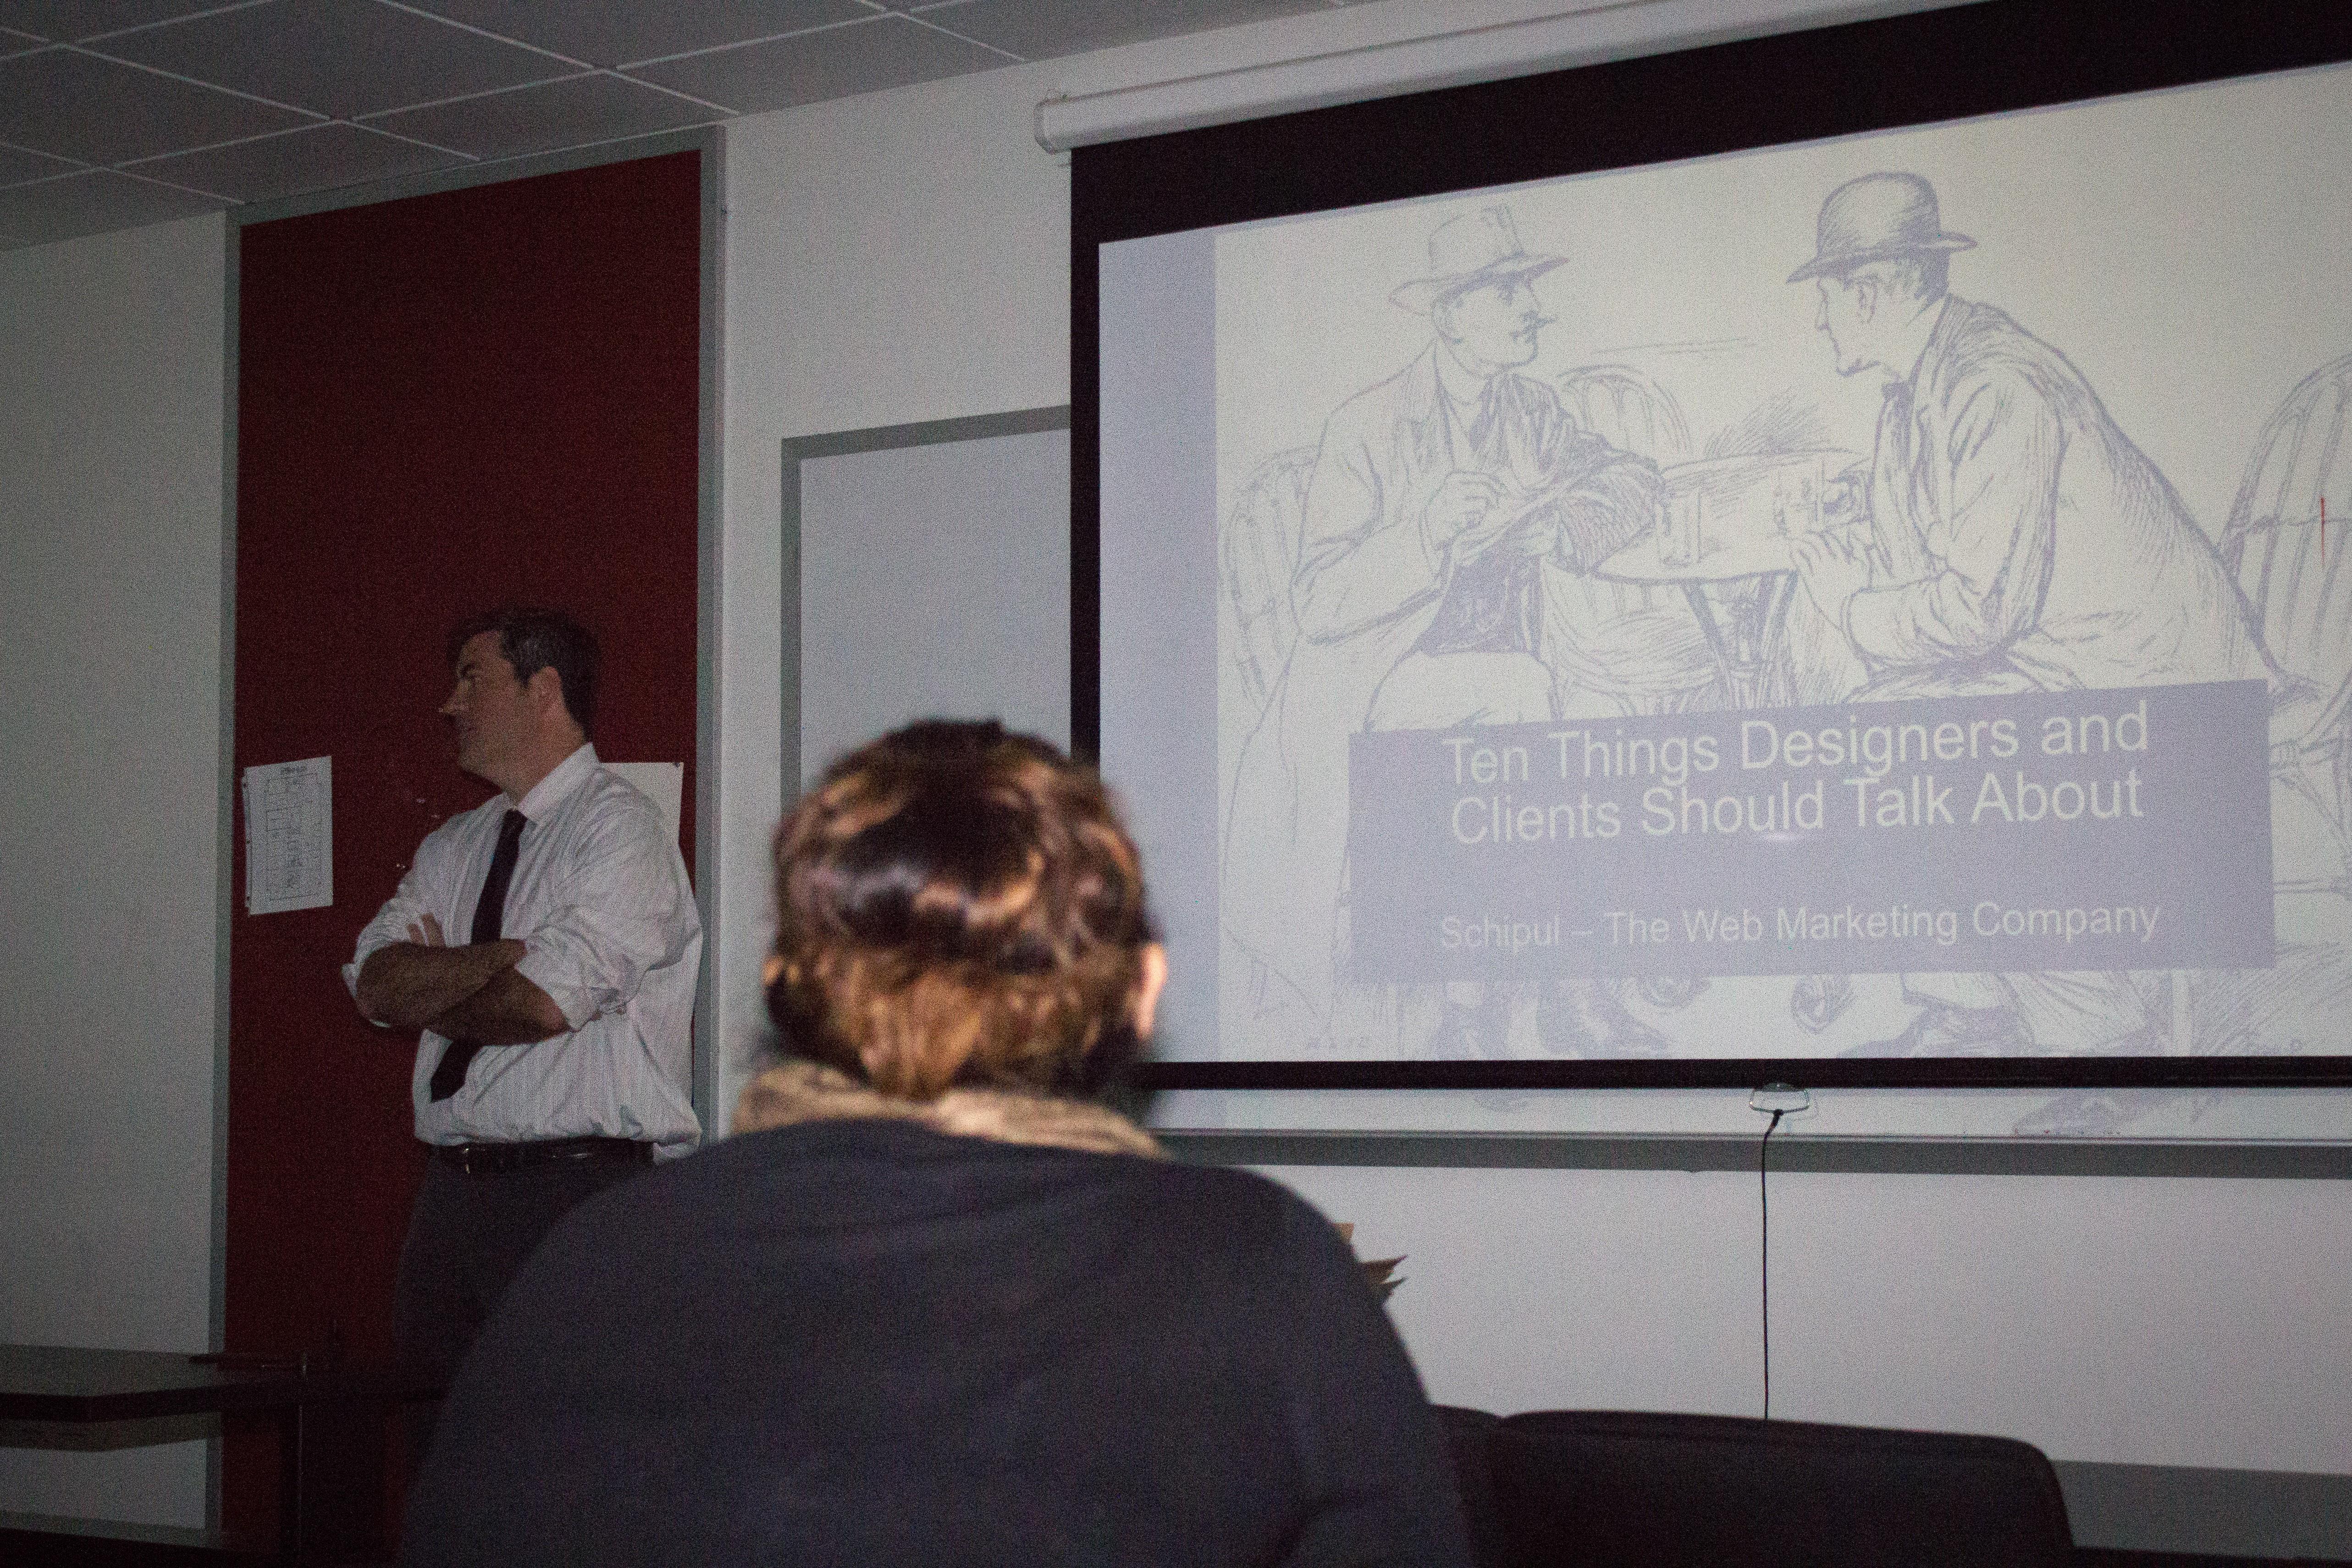 Houston Website Designers Schipul Public Speaking 2012-5